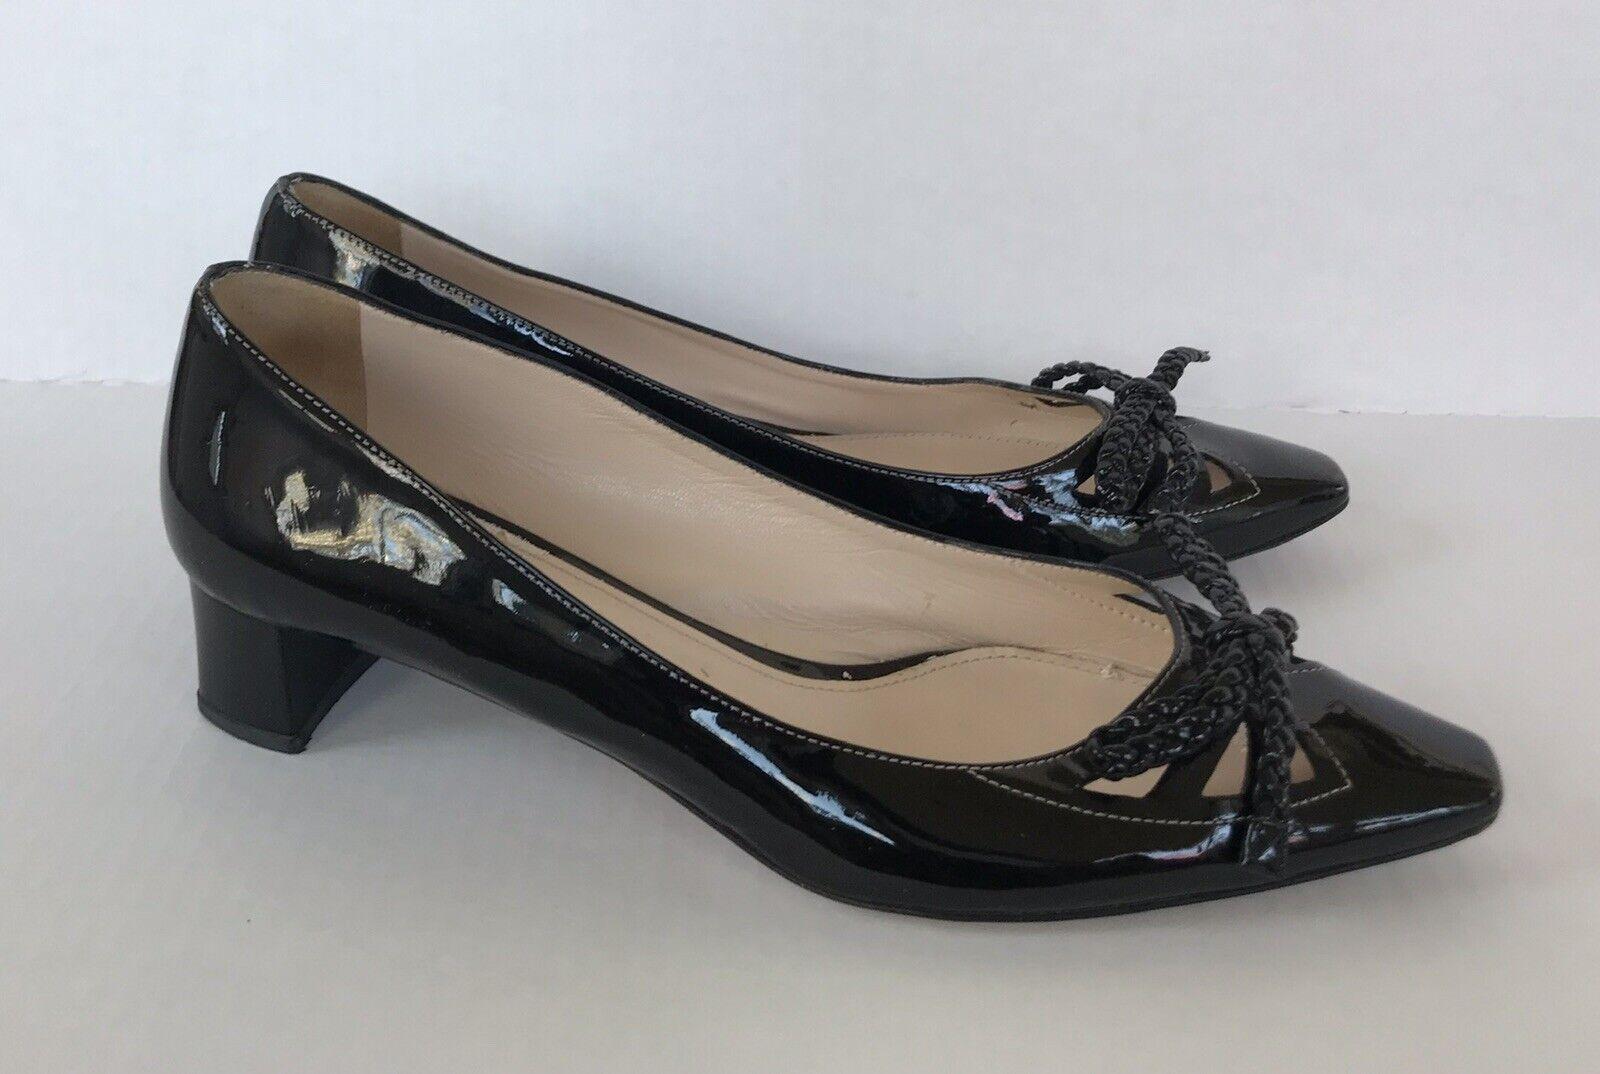 Vintage 1990s Prada Patent Leather Bow Flats Sz 39 - image 2